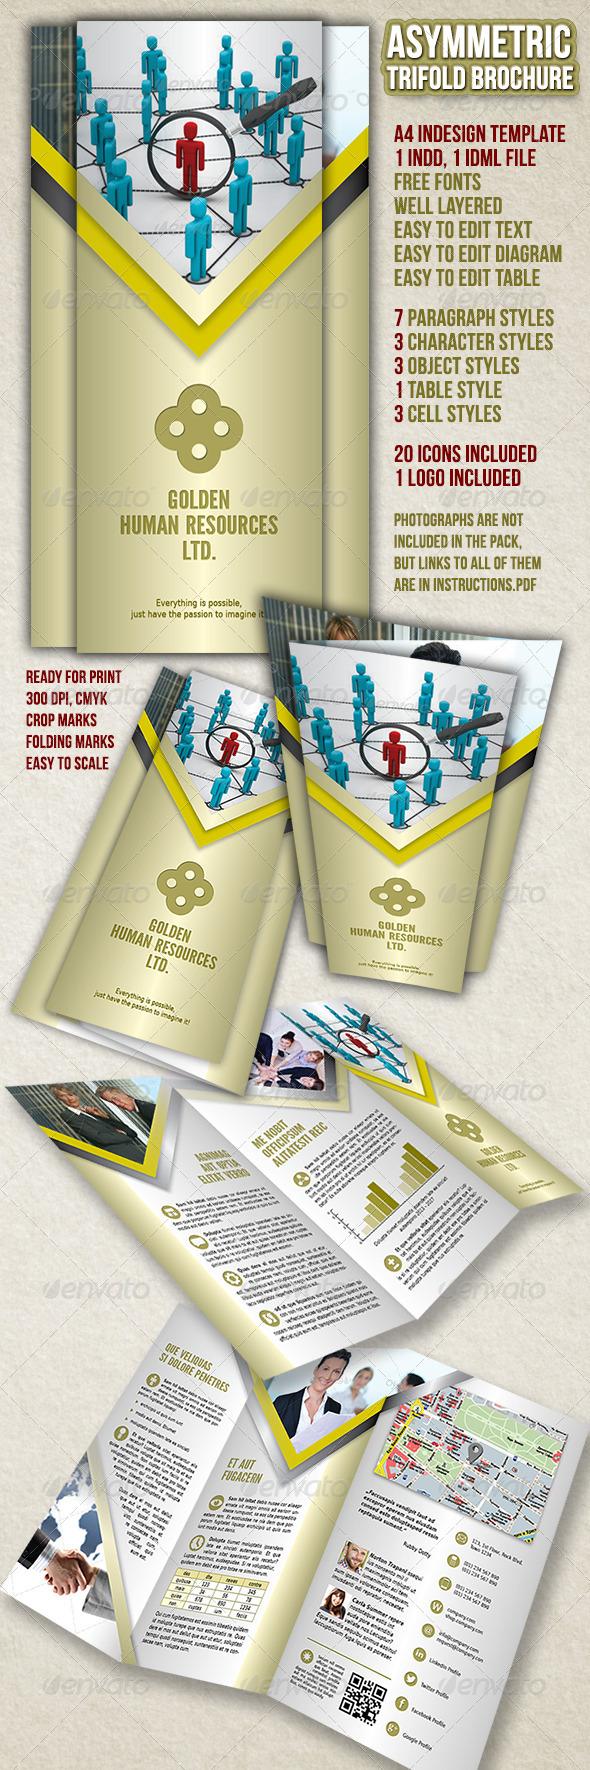 GraphicRiver Asymmetric Trifold Brochure A4 4426703